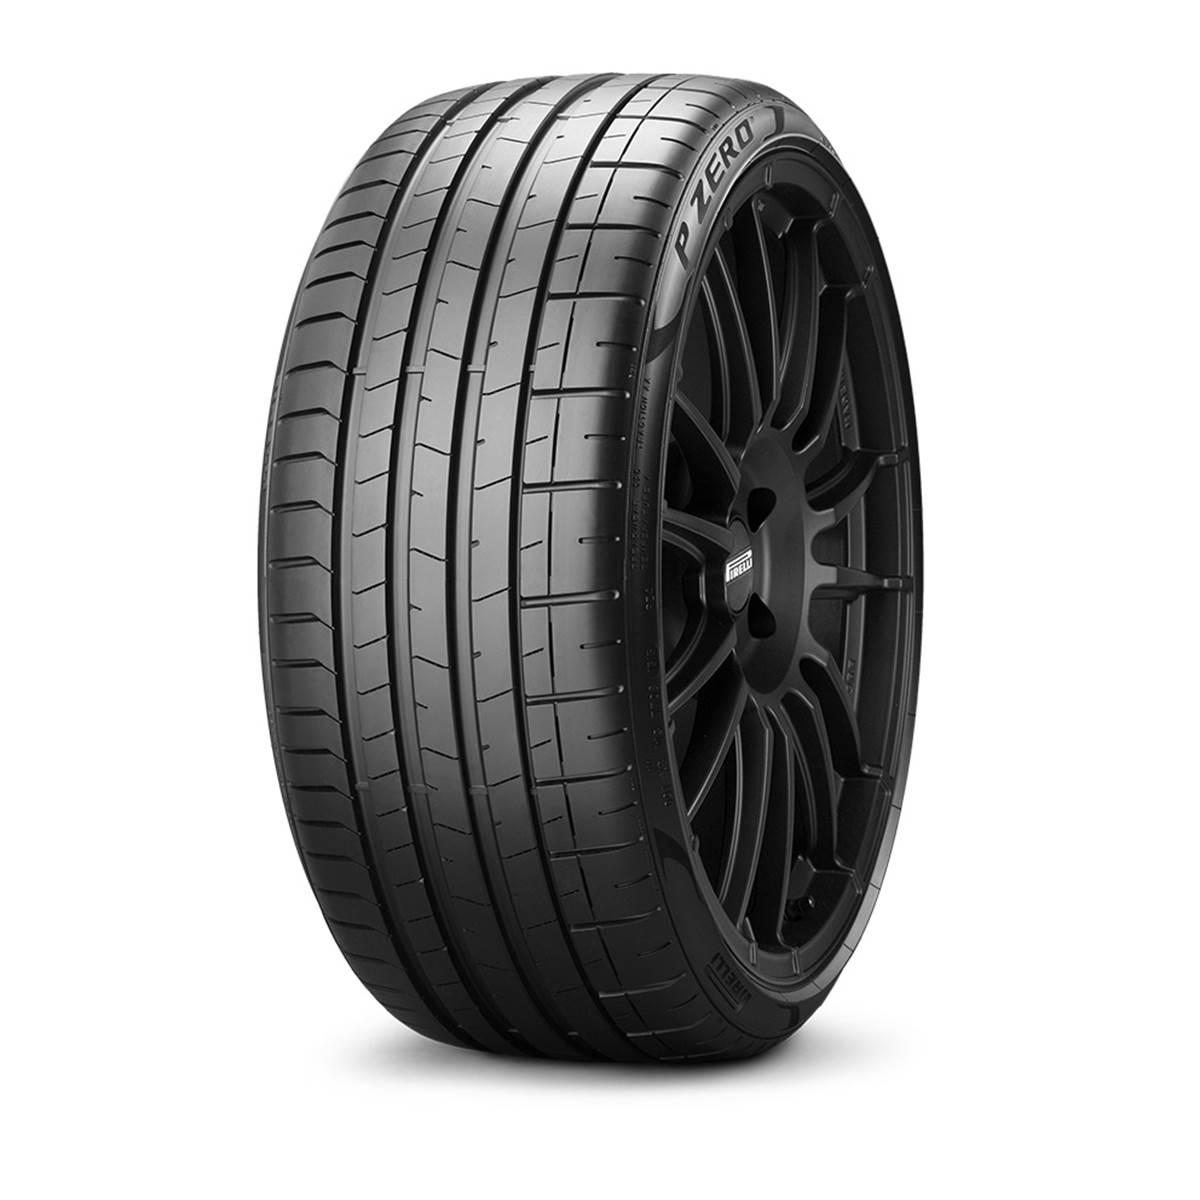 Pneu Runflat Pirelli 225/40R18 92W Pzero XL